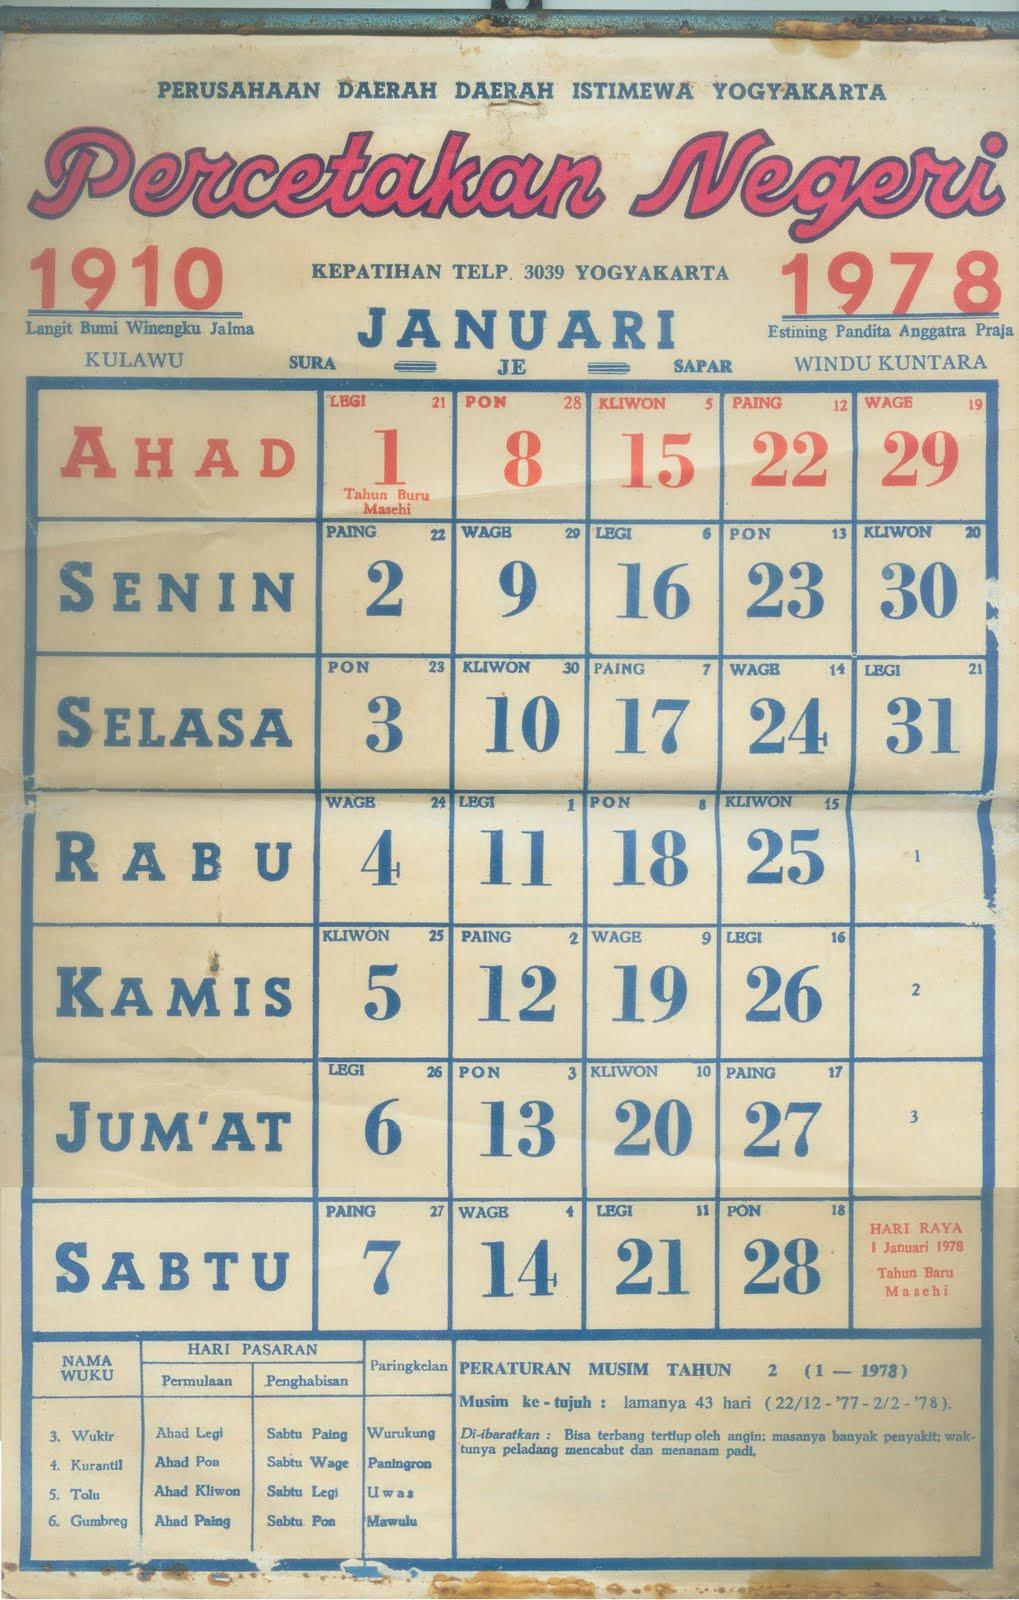 71 Tren Gaya Gambar Kalender Tahun 1977 Desain Kalender Sedangkan akhir tahun 1977 (masehi) bertepatan dengan tanggal 19 muharram 1398 (hijriyah), 20 sura 1910 (jawa), 14s margasira 1913 (candra), dan 10 kasa 1900 (surya). tren gaya gambar kalender tahun 1977